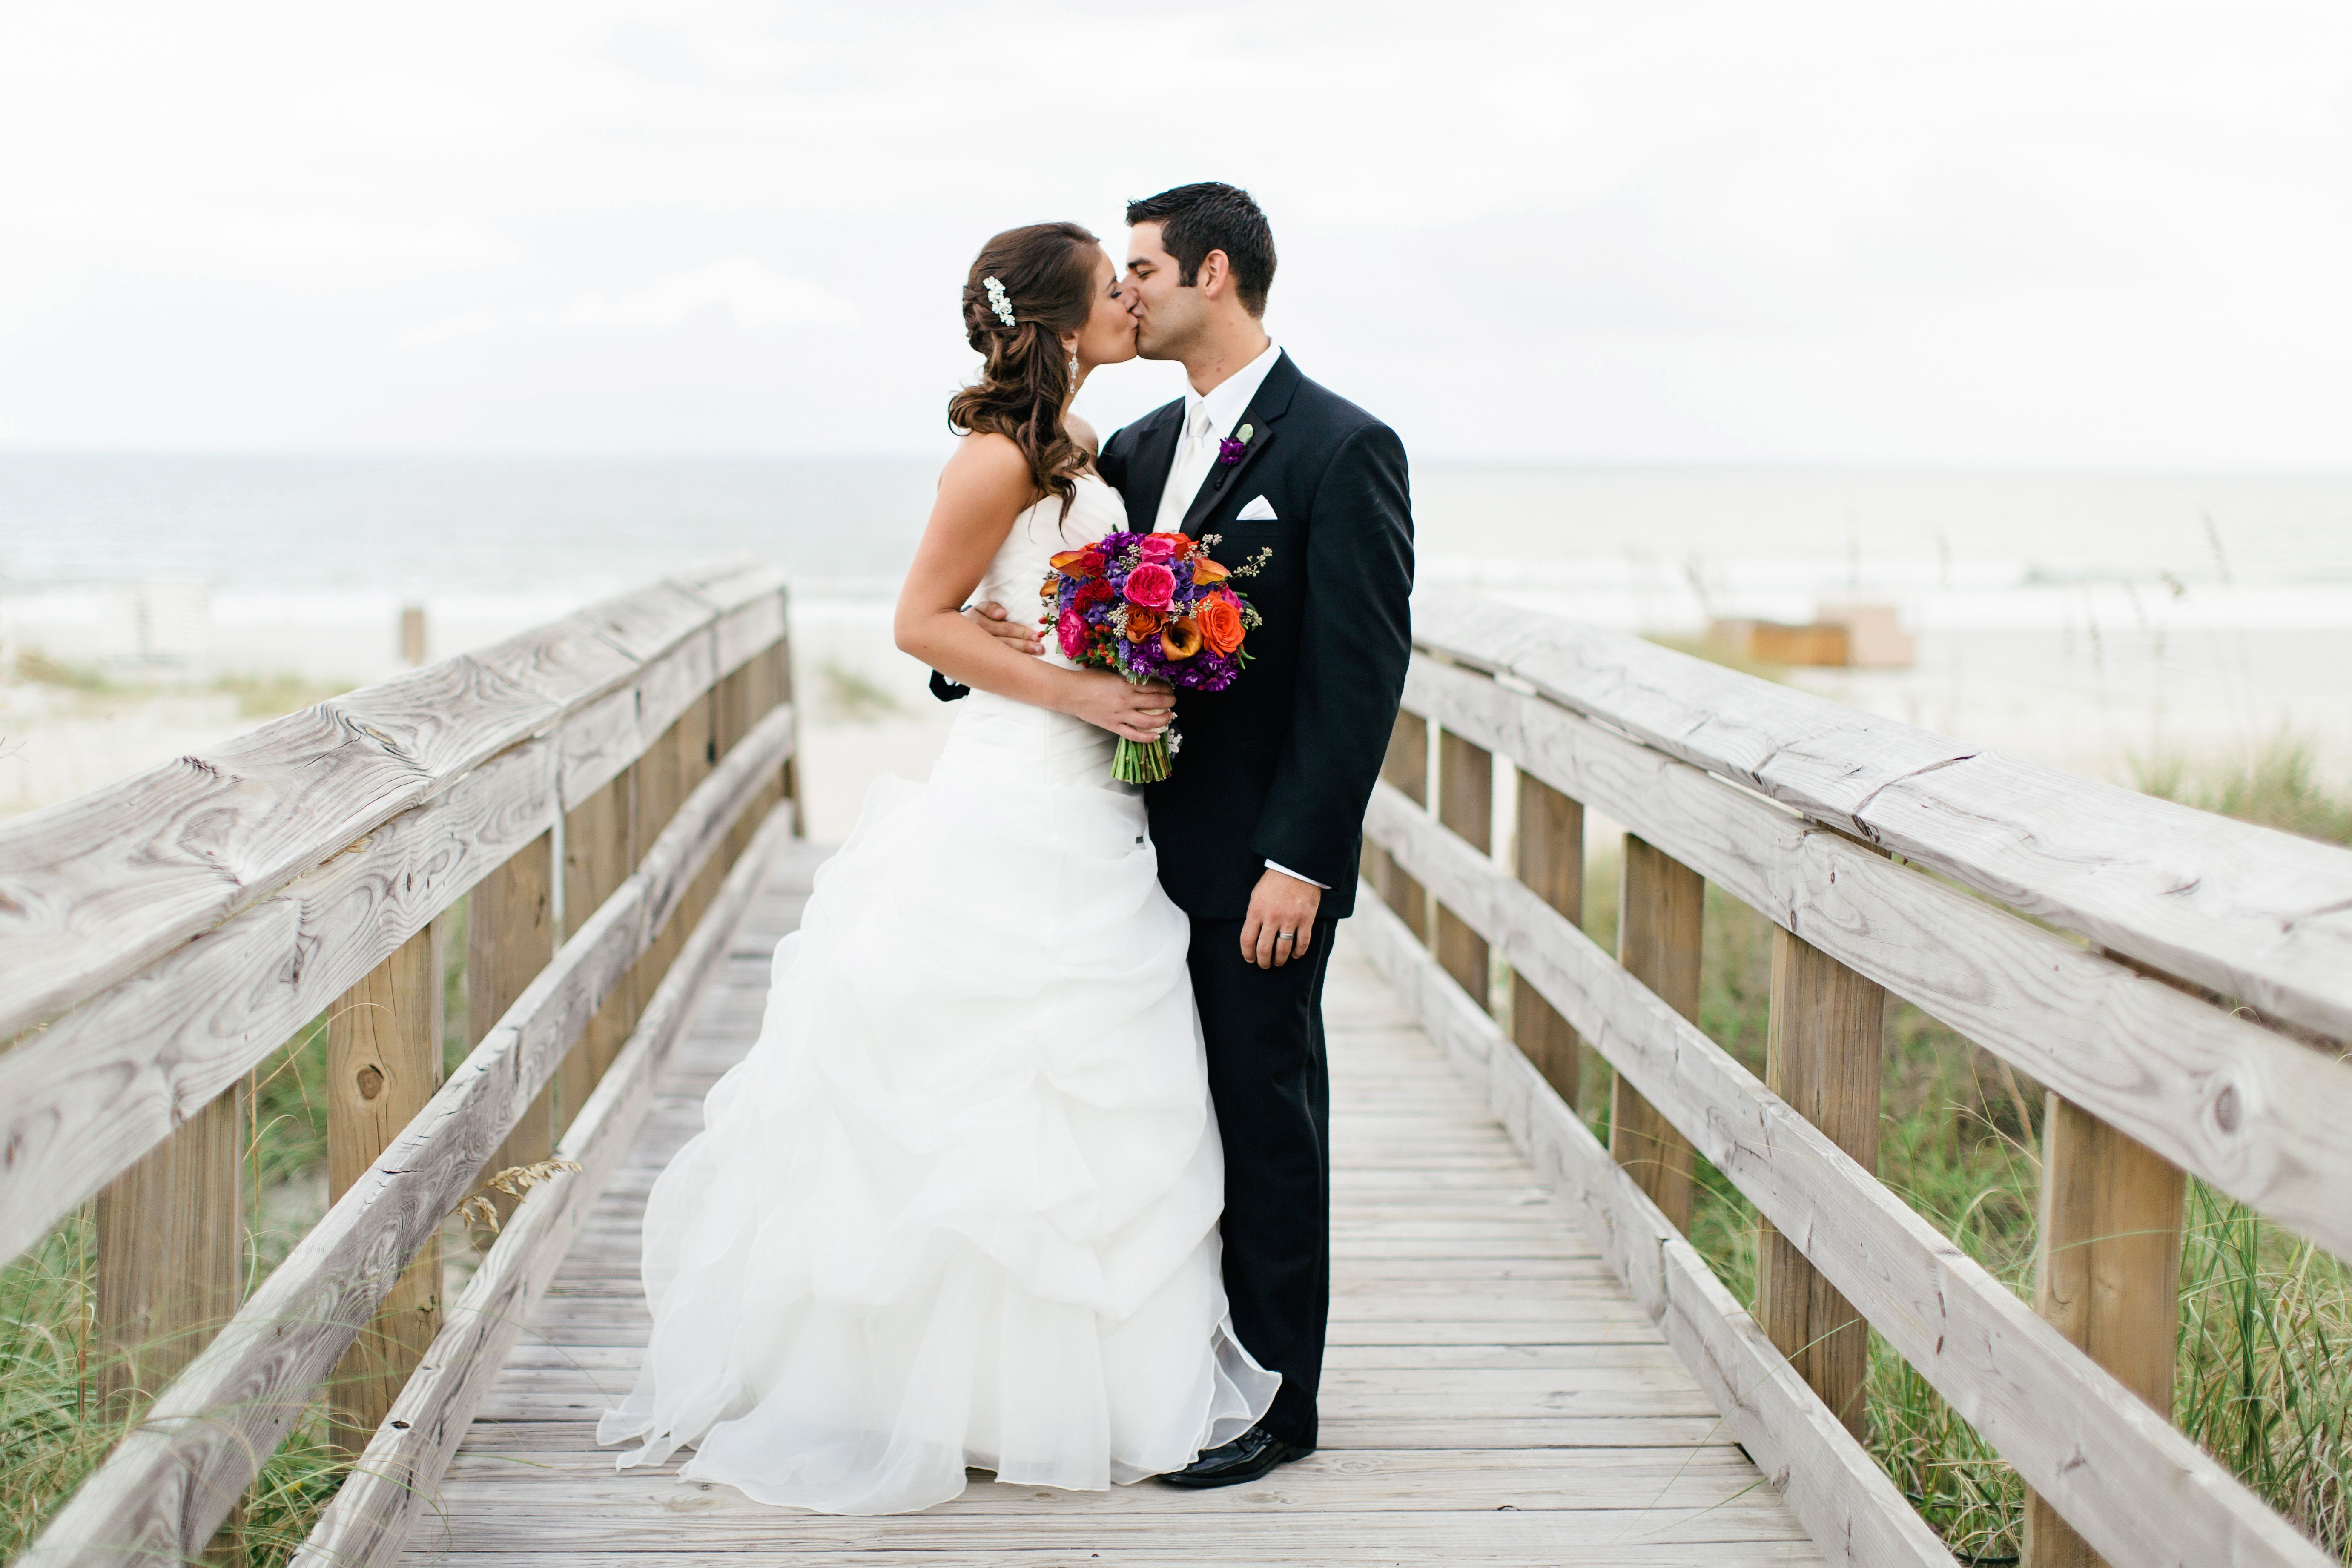 boardwalk wedding photo